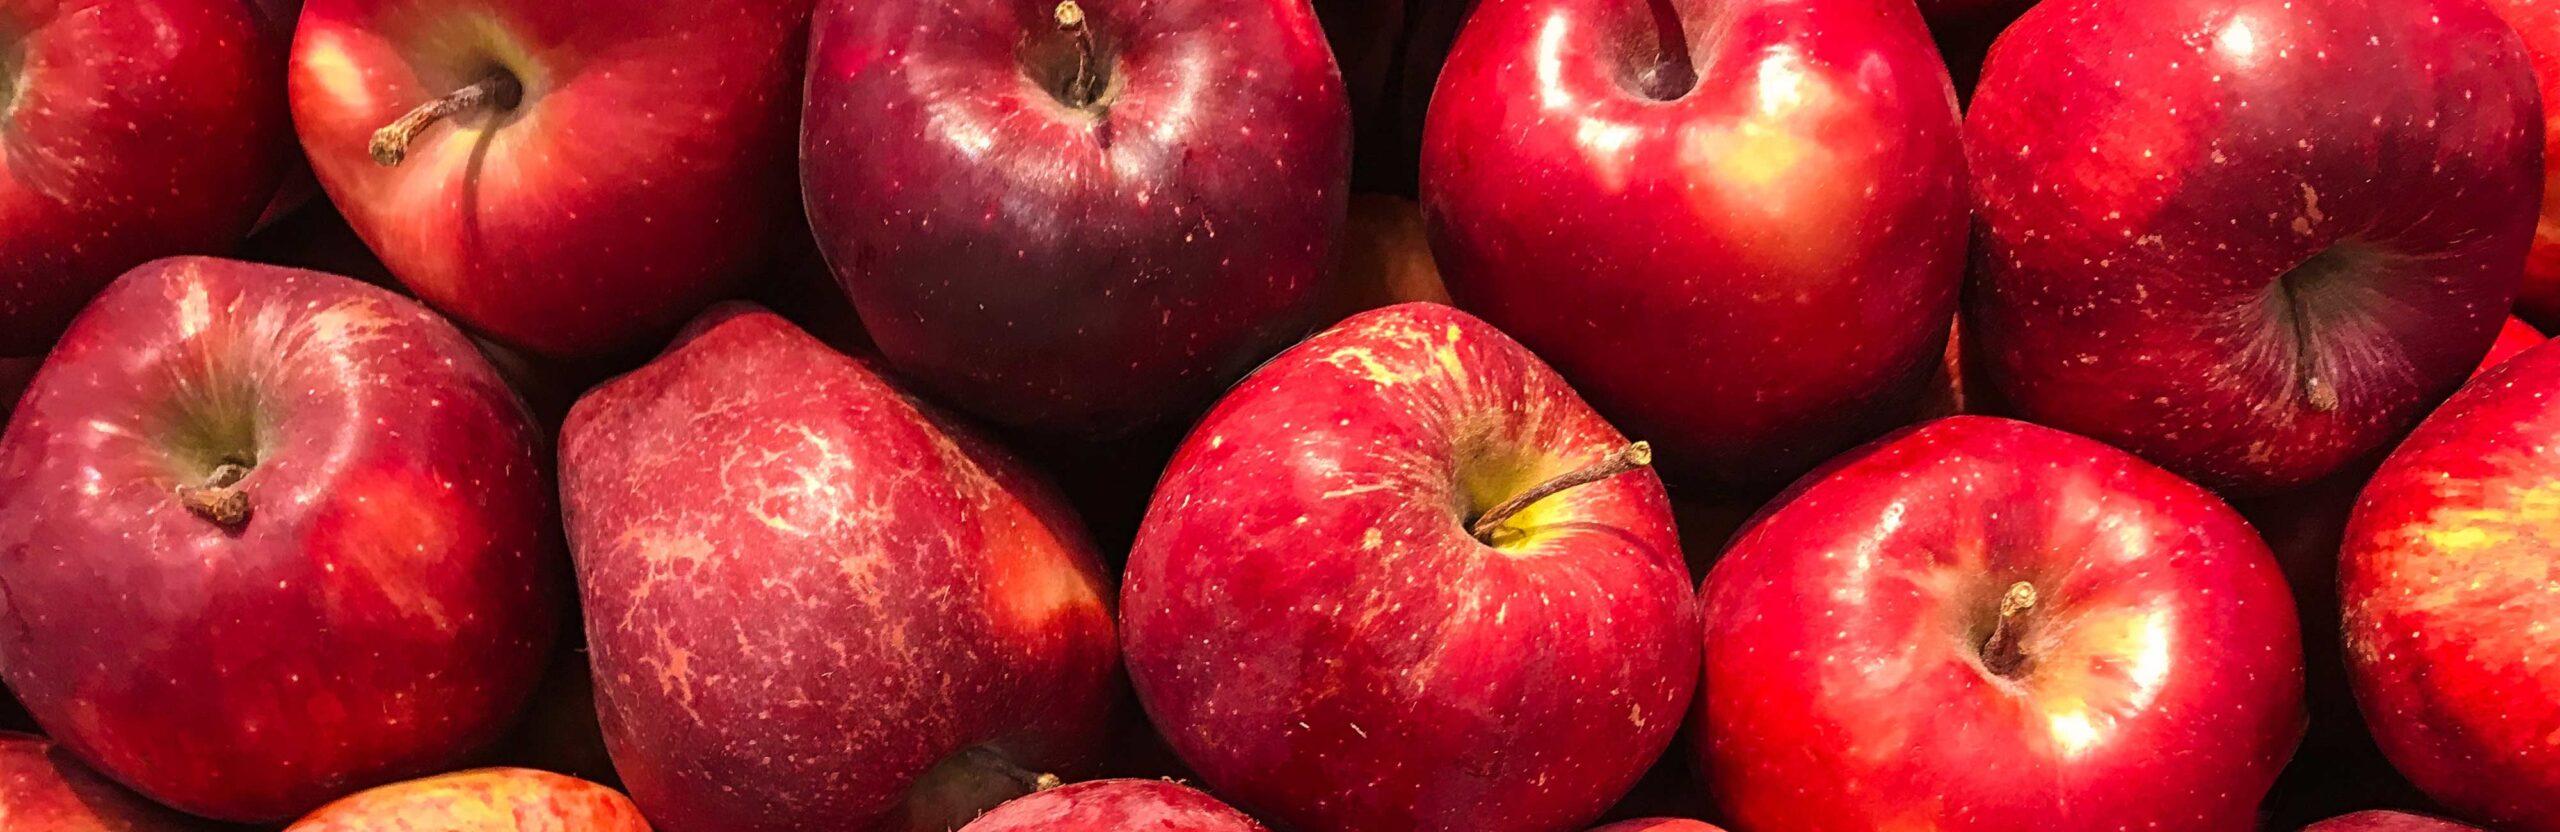 Kunskap - Röda äpplen